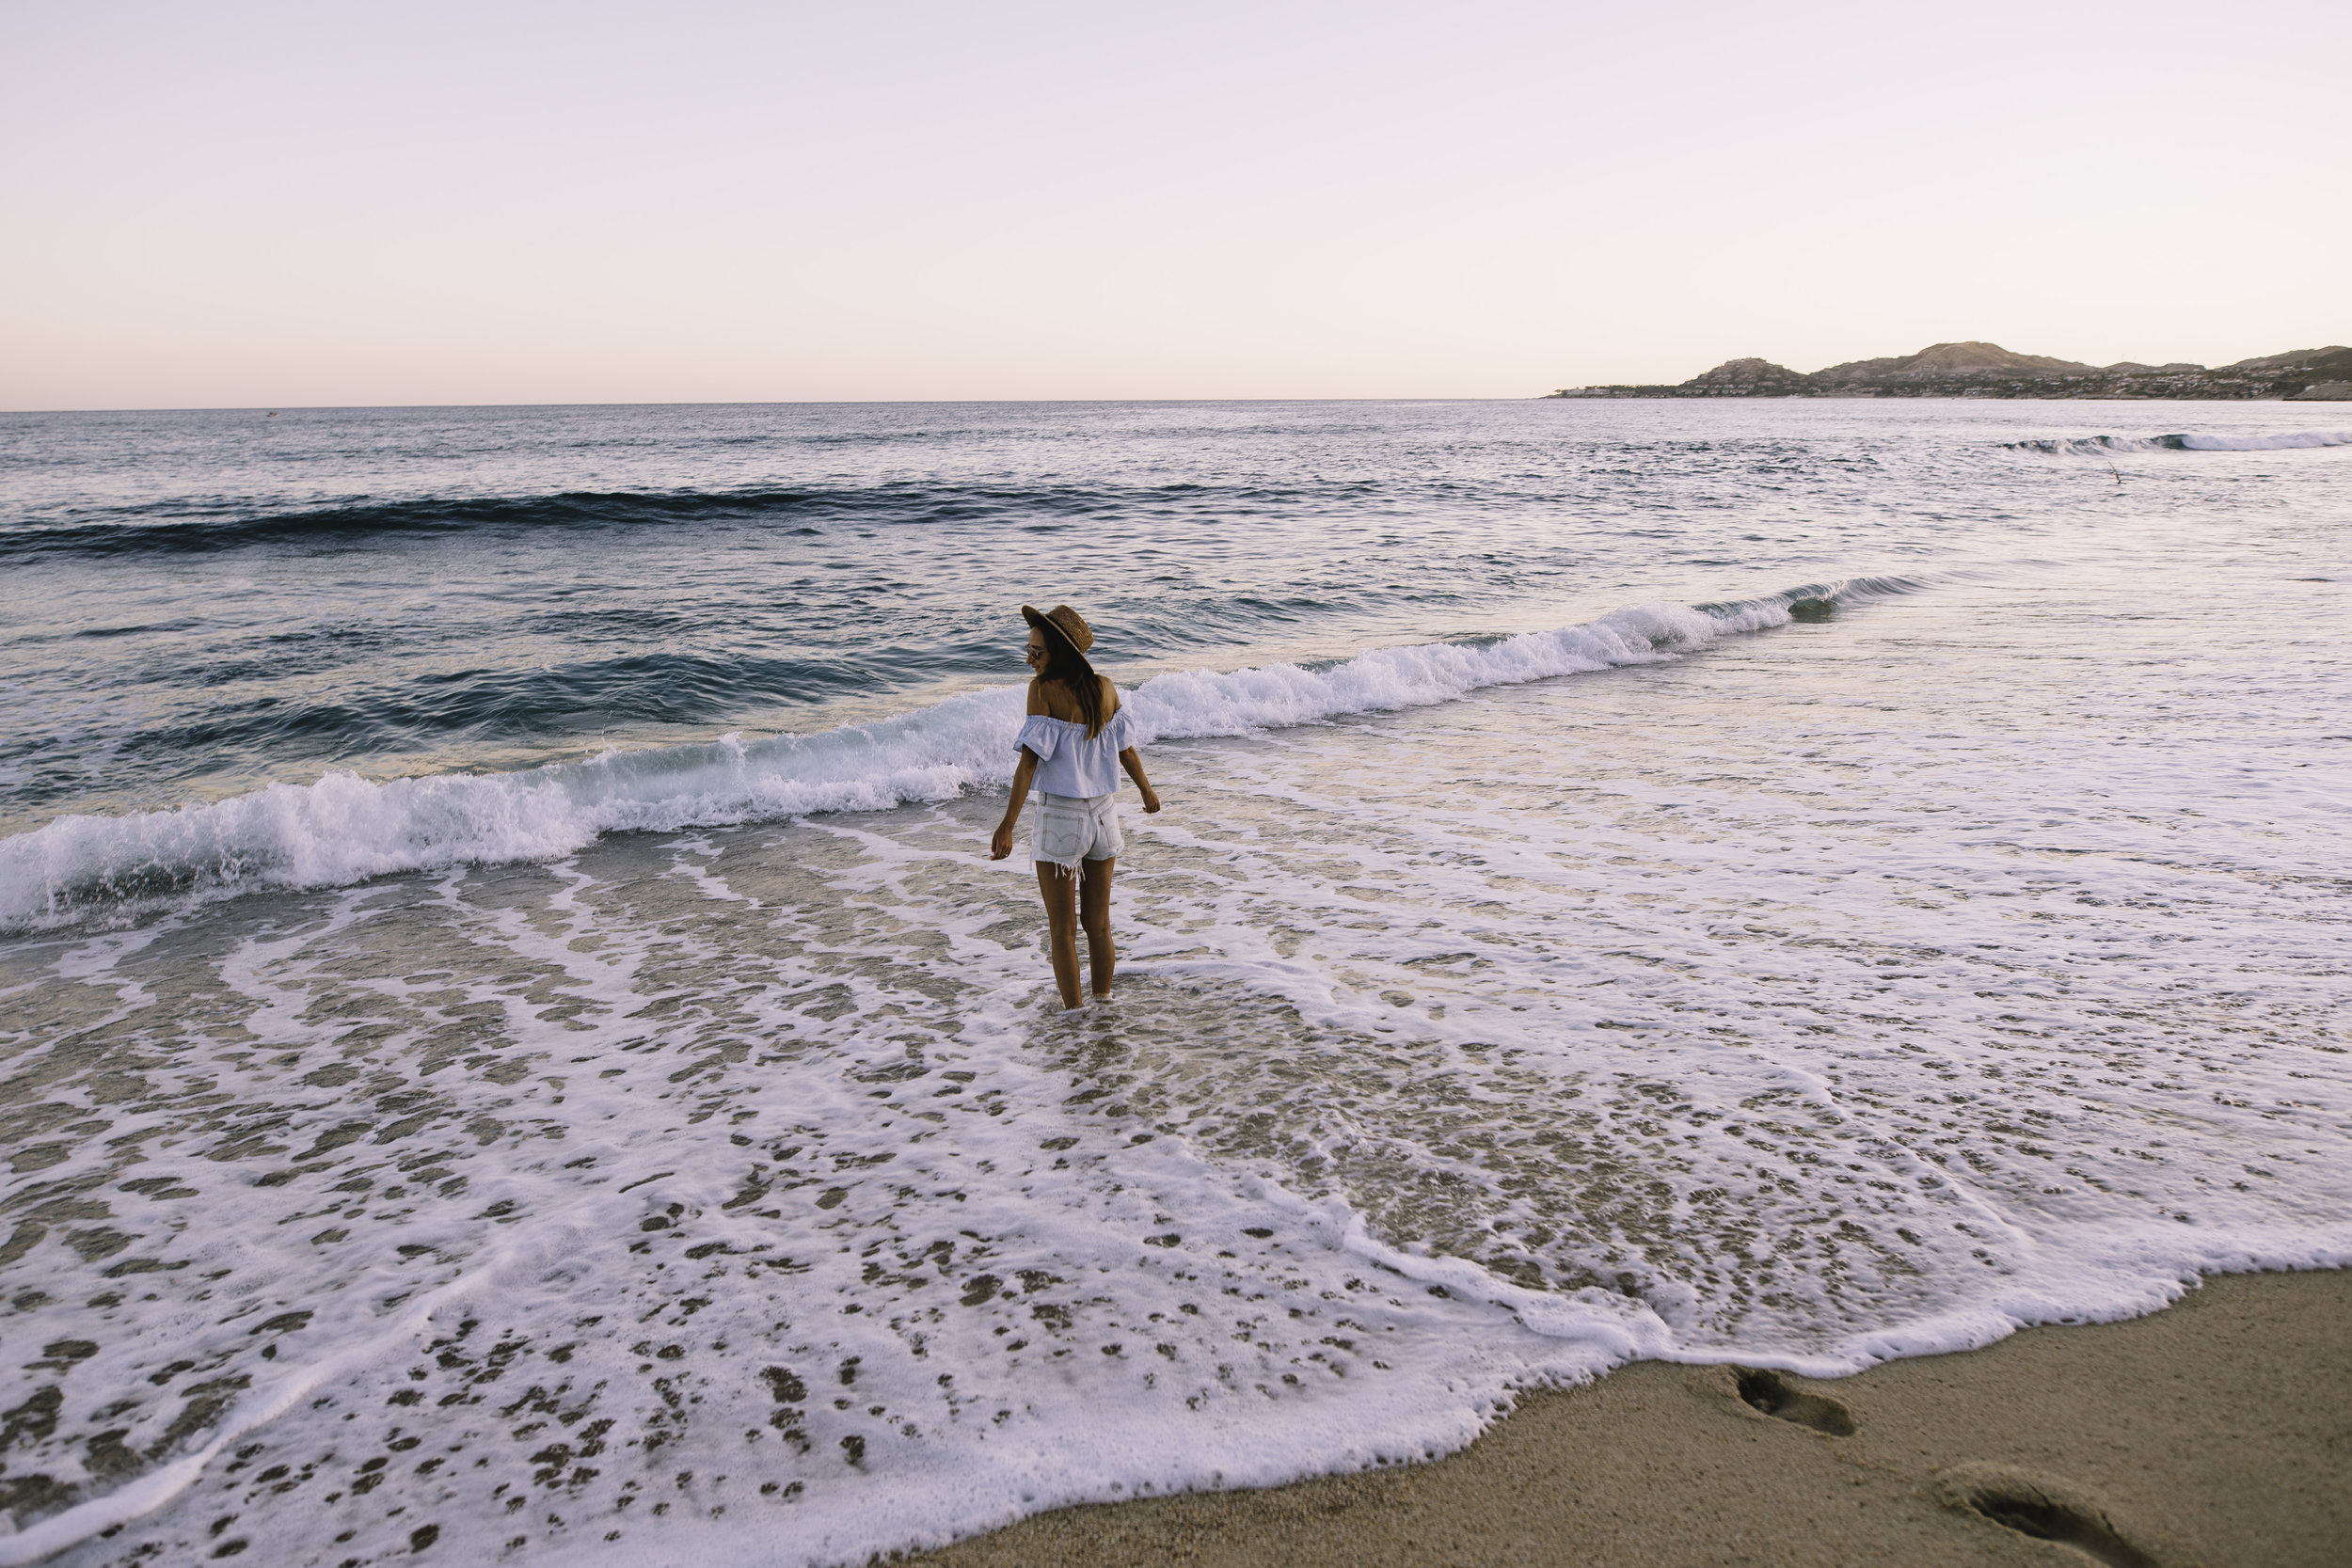 Playa Hotelera Beach